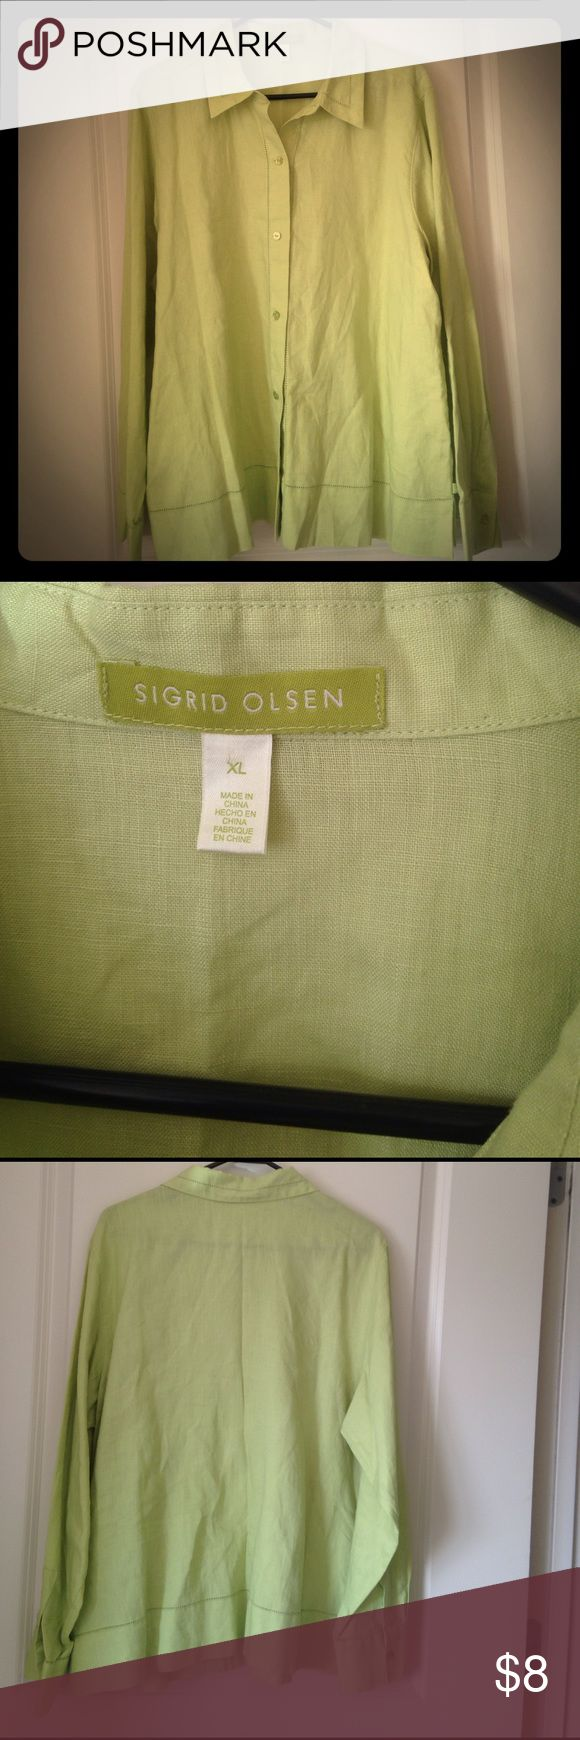 Lime green linen shirt Sigrid Olsen 100% linen shirt. Beautiful, bright lime green. Very summer like!! Sigrid Olsen Tops Button Down Shirts